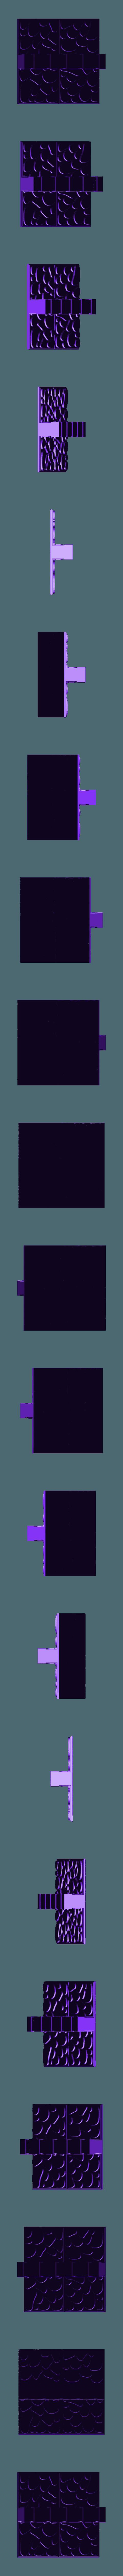 Finalized_Wall_I.stl Download STL file GeneriTiles - Tabletop RPG Tileset • 3D printable object, daandruff